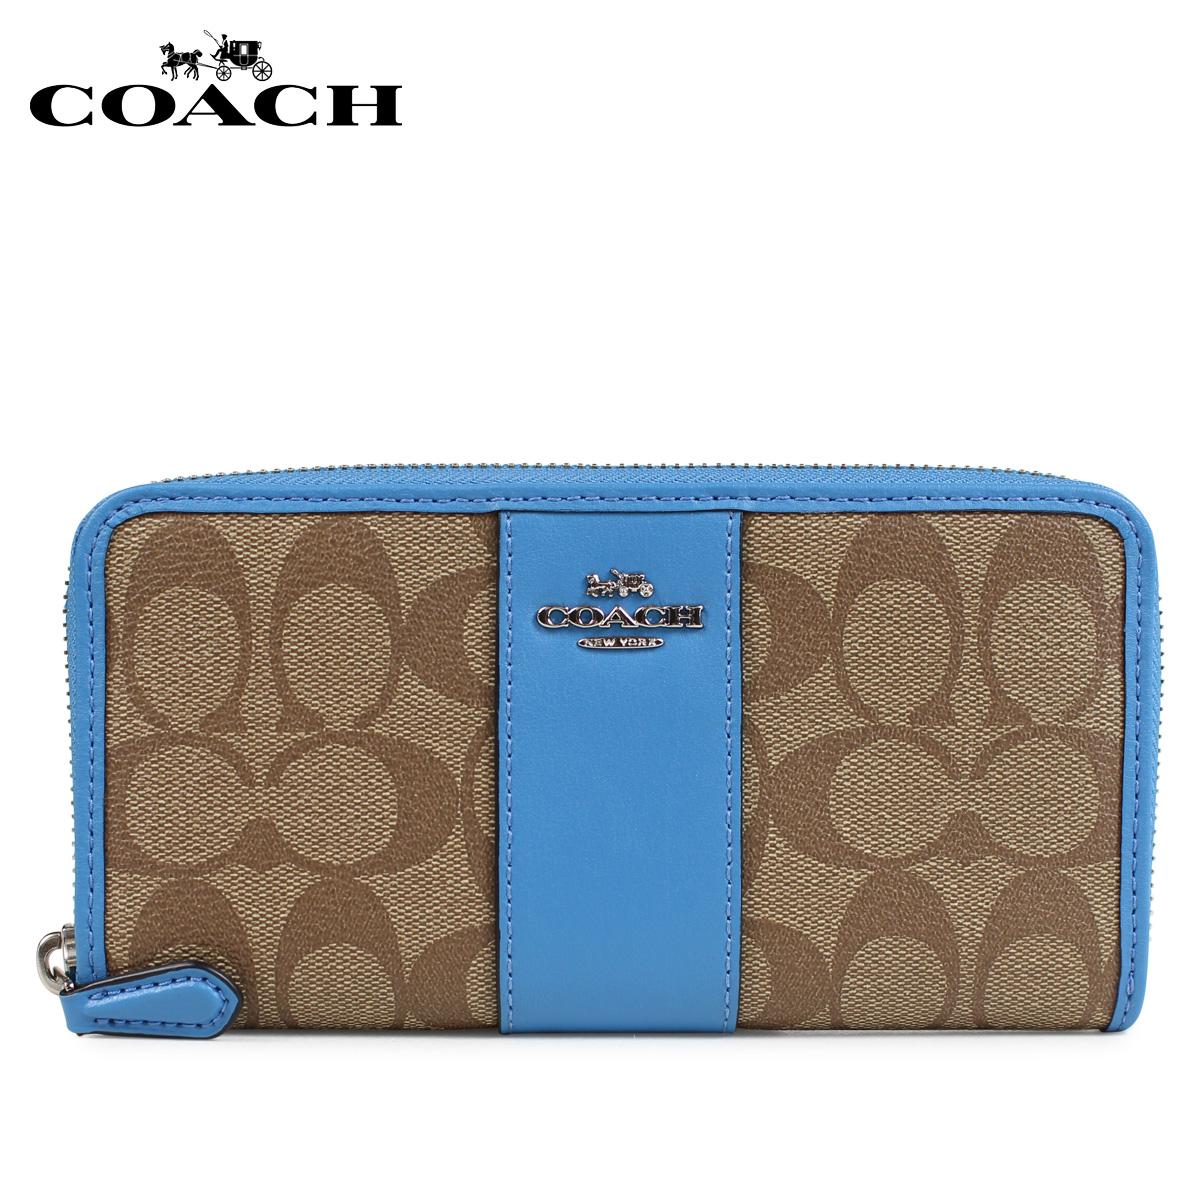 COACH F54630 コーチ 財布 長財布 レディース ラウンドファスナー シグネチャー レザー カーキ